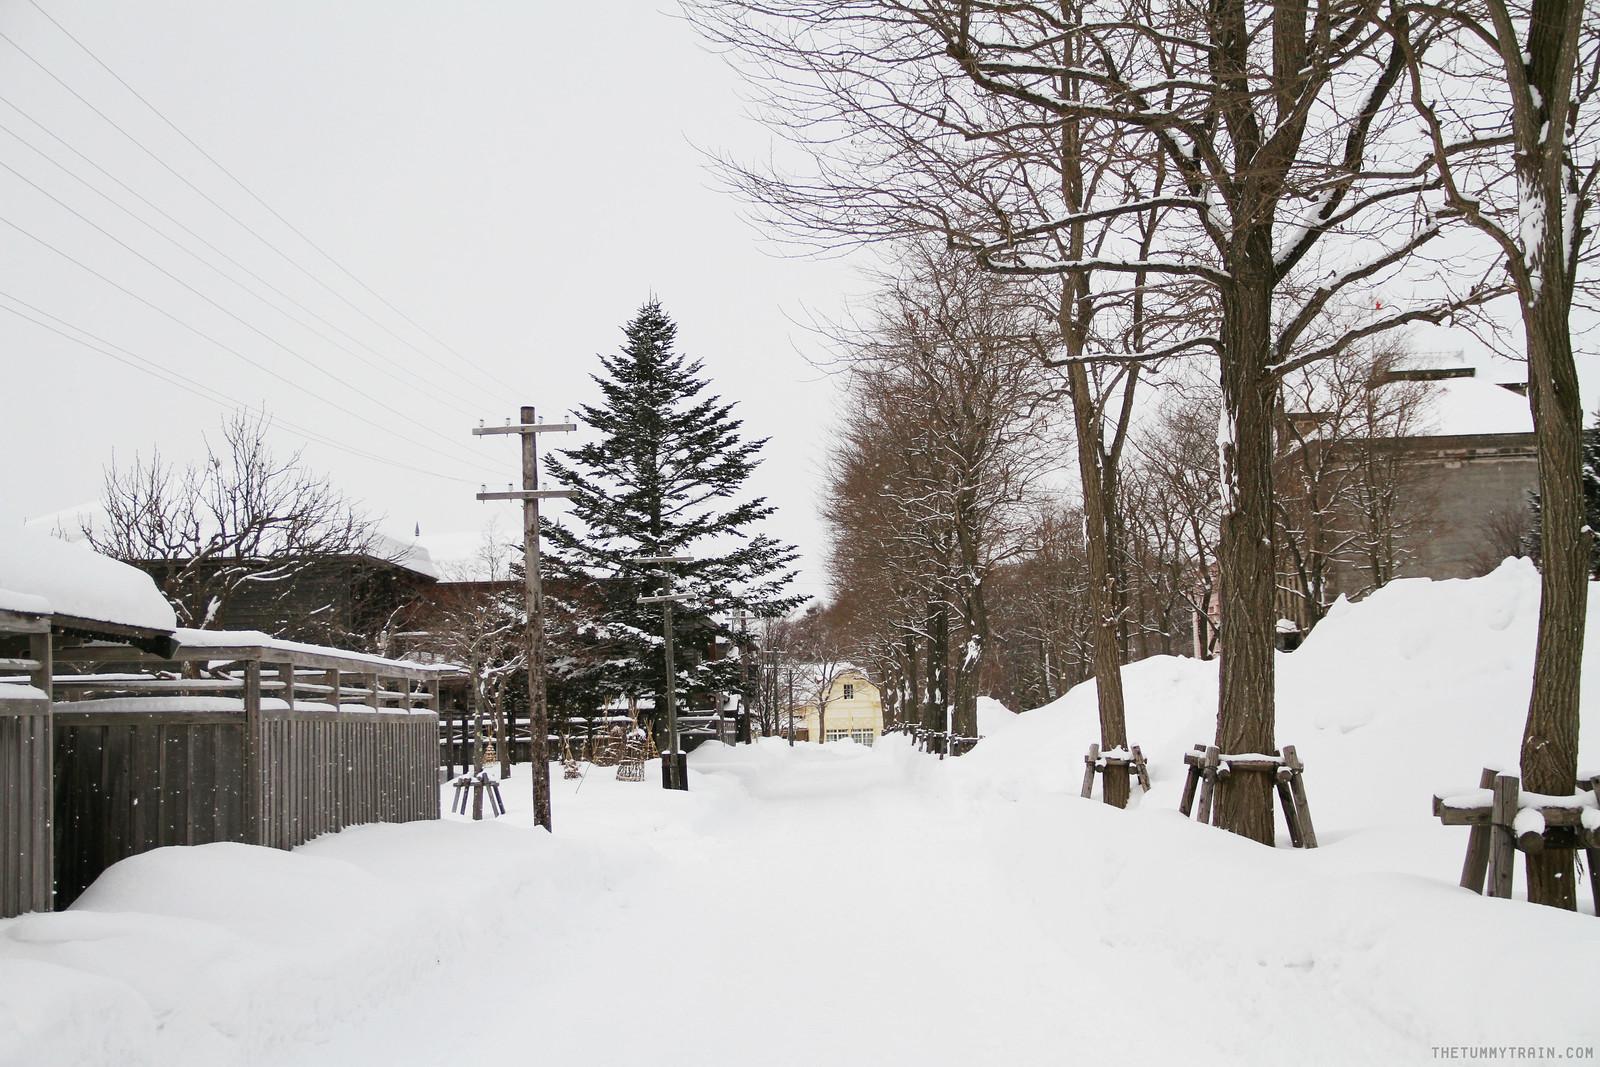 32535124840 d23f402ecd h - Sapporo Snow And Smile: 8 Unforgettable Winter Experiences in Sapporo City